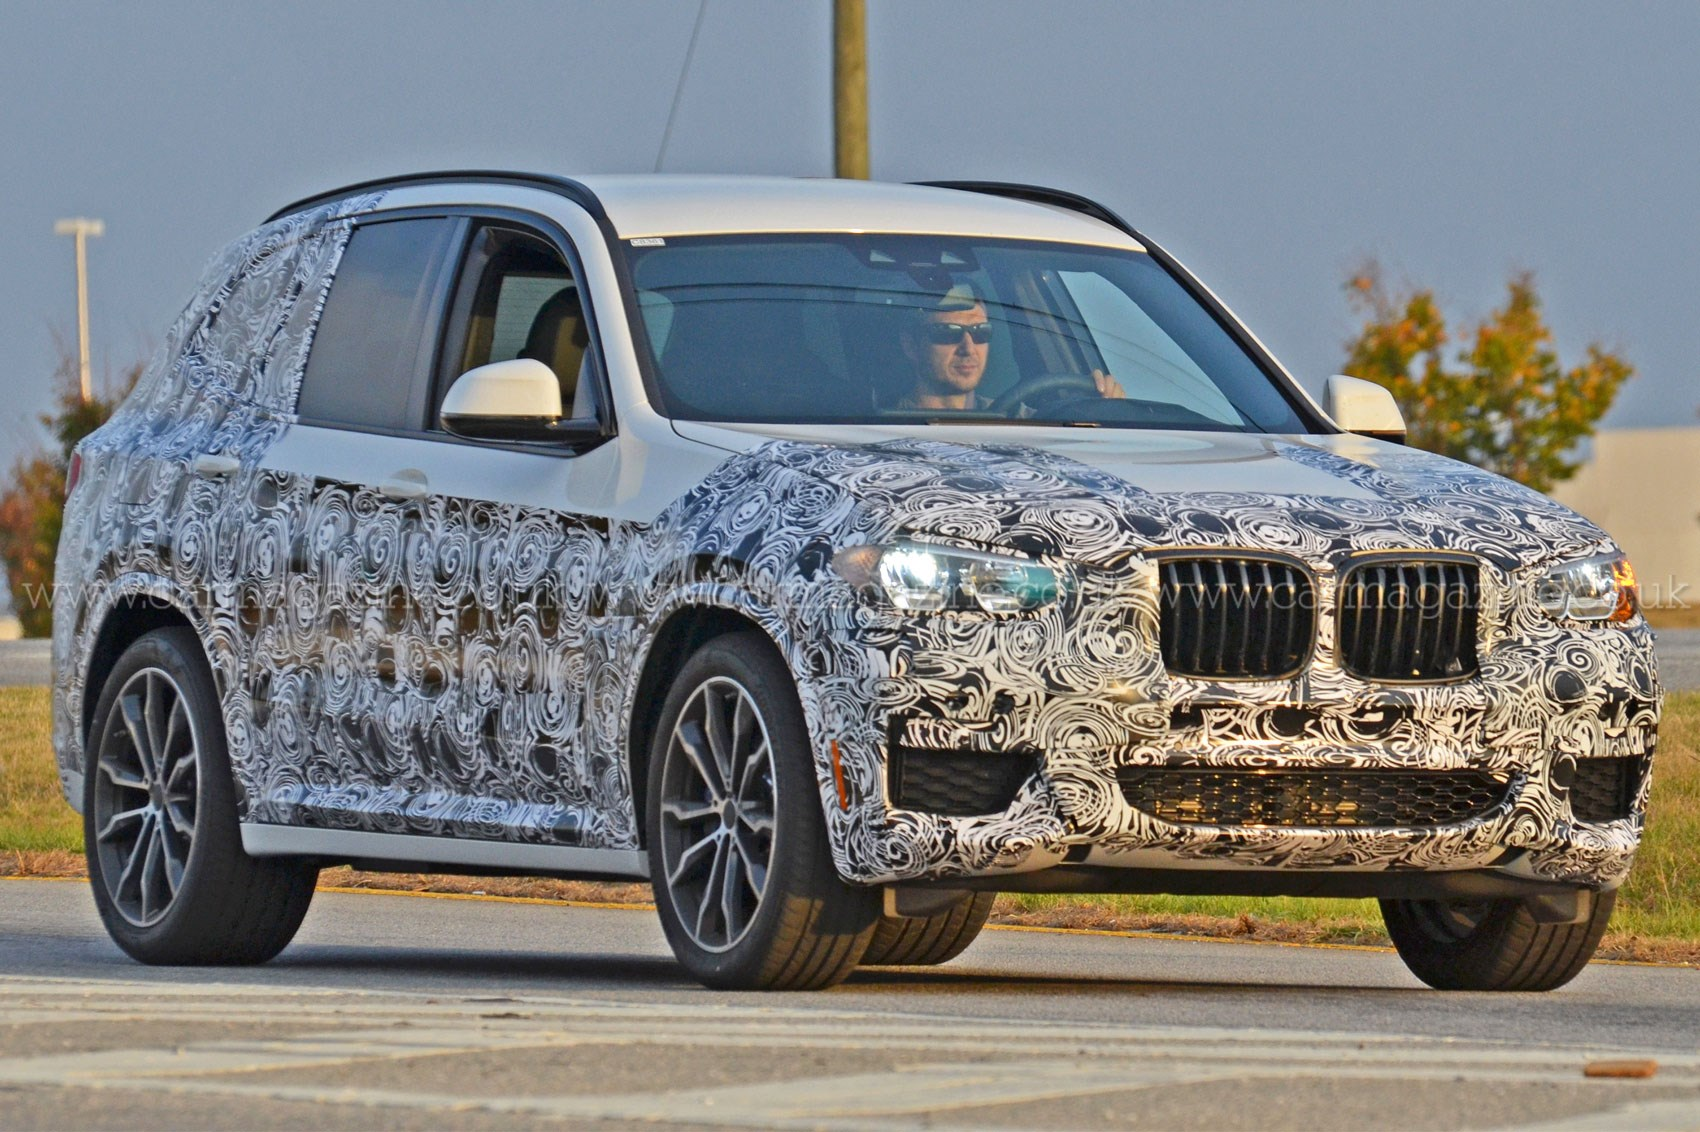 2018 BMW X3: Redesign, Platform, Changes >> The Next Bmw X3 Spied Full Scoop On 2017 S G01 Suv Car Magazine